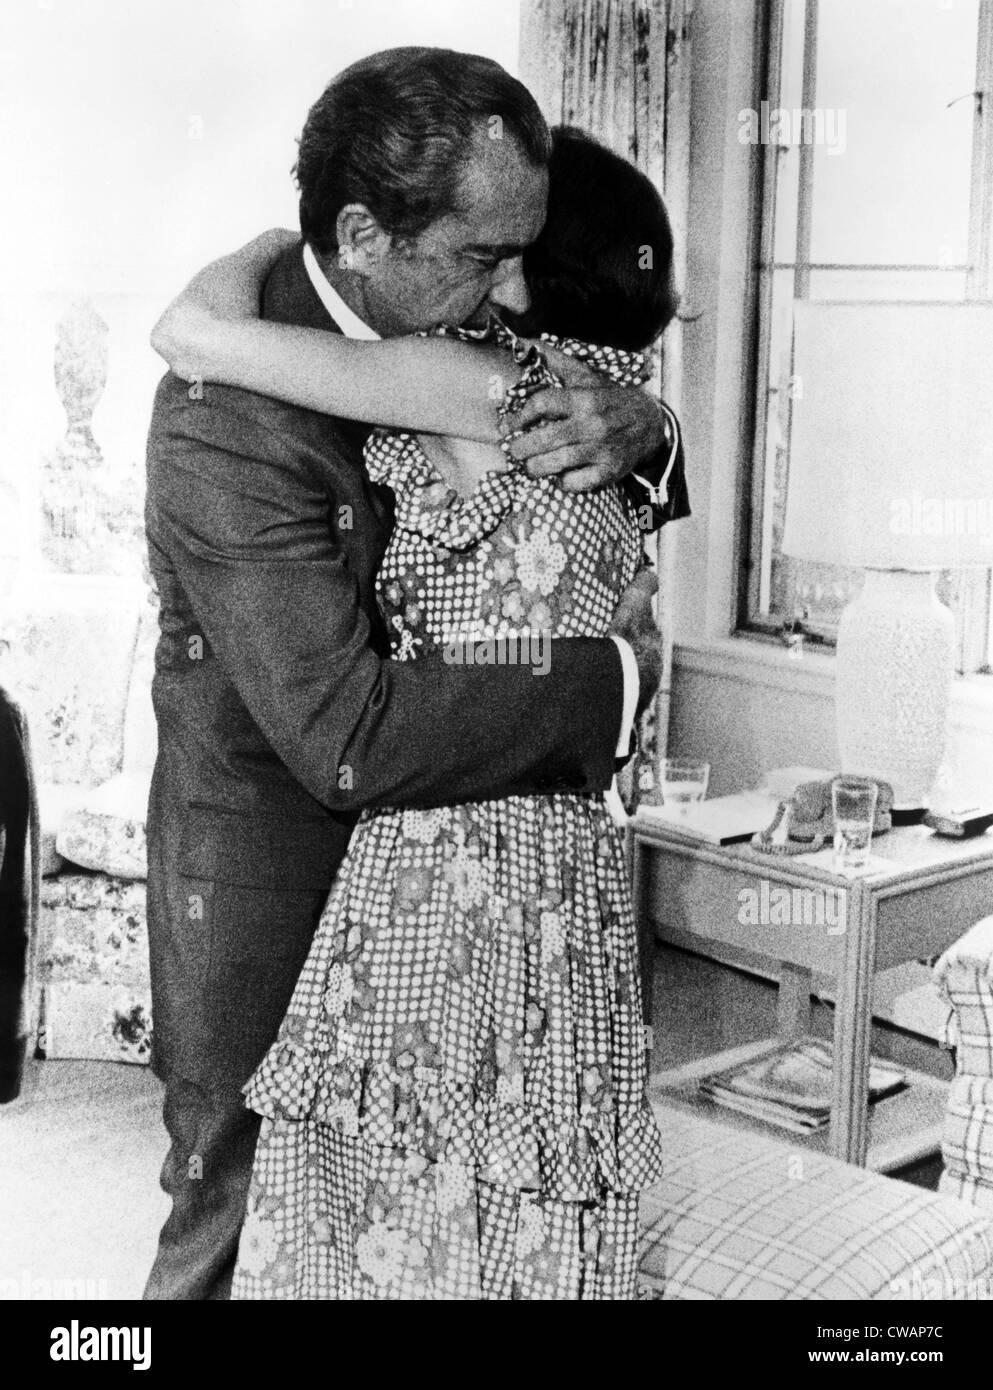 U.S. President Richard Nixon hugging his daughter Julie Nixon Eisenhower after informing her that he must resign, - Stock Image